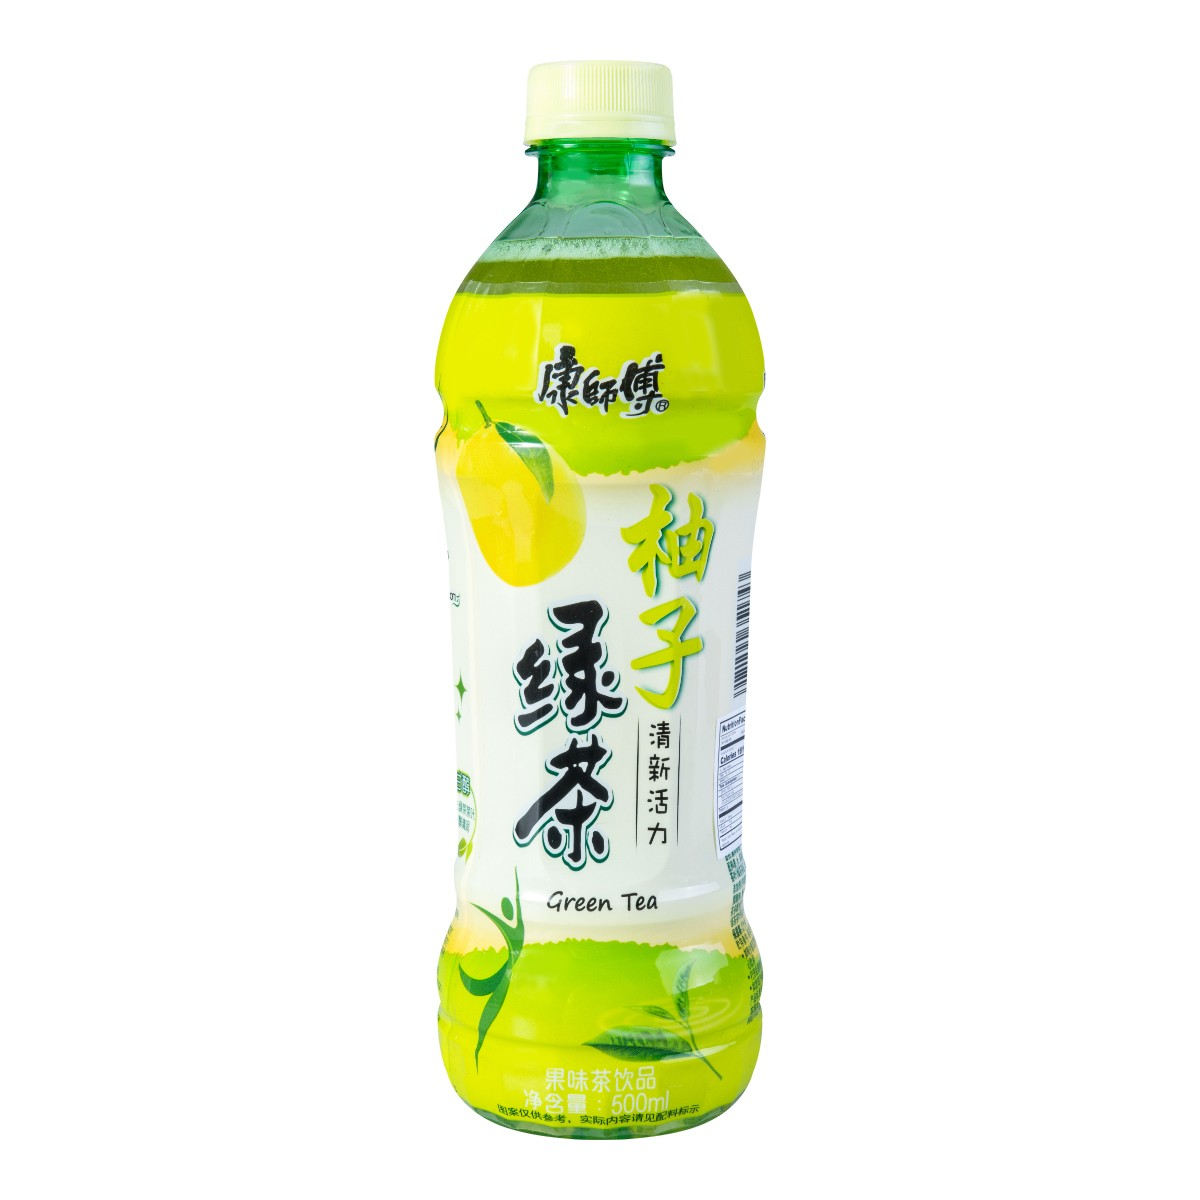 MASTER KONG Grapefruit Green Tea 500ml